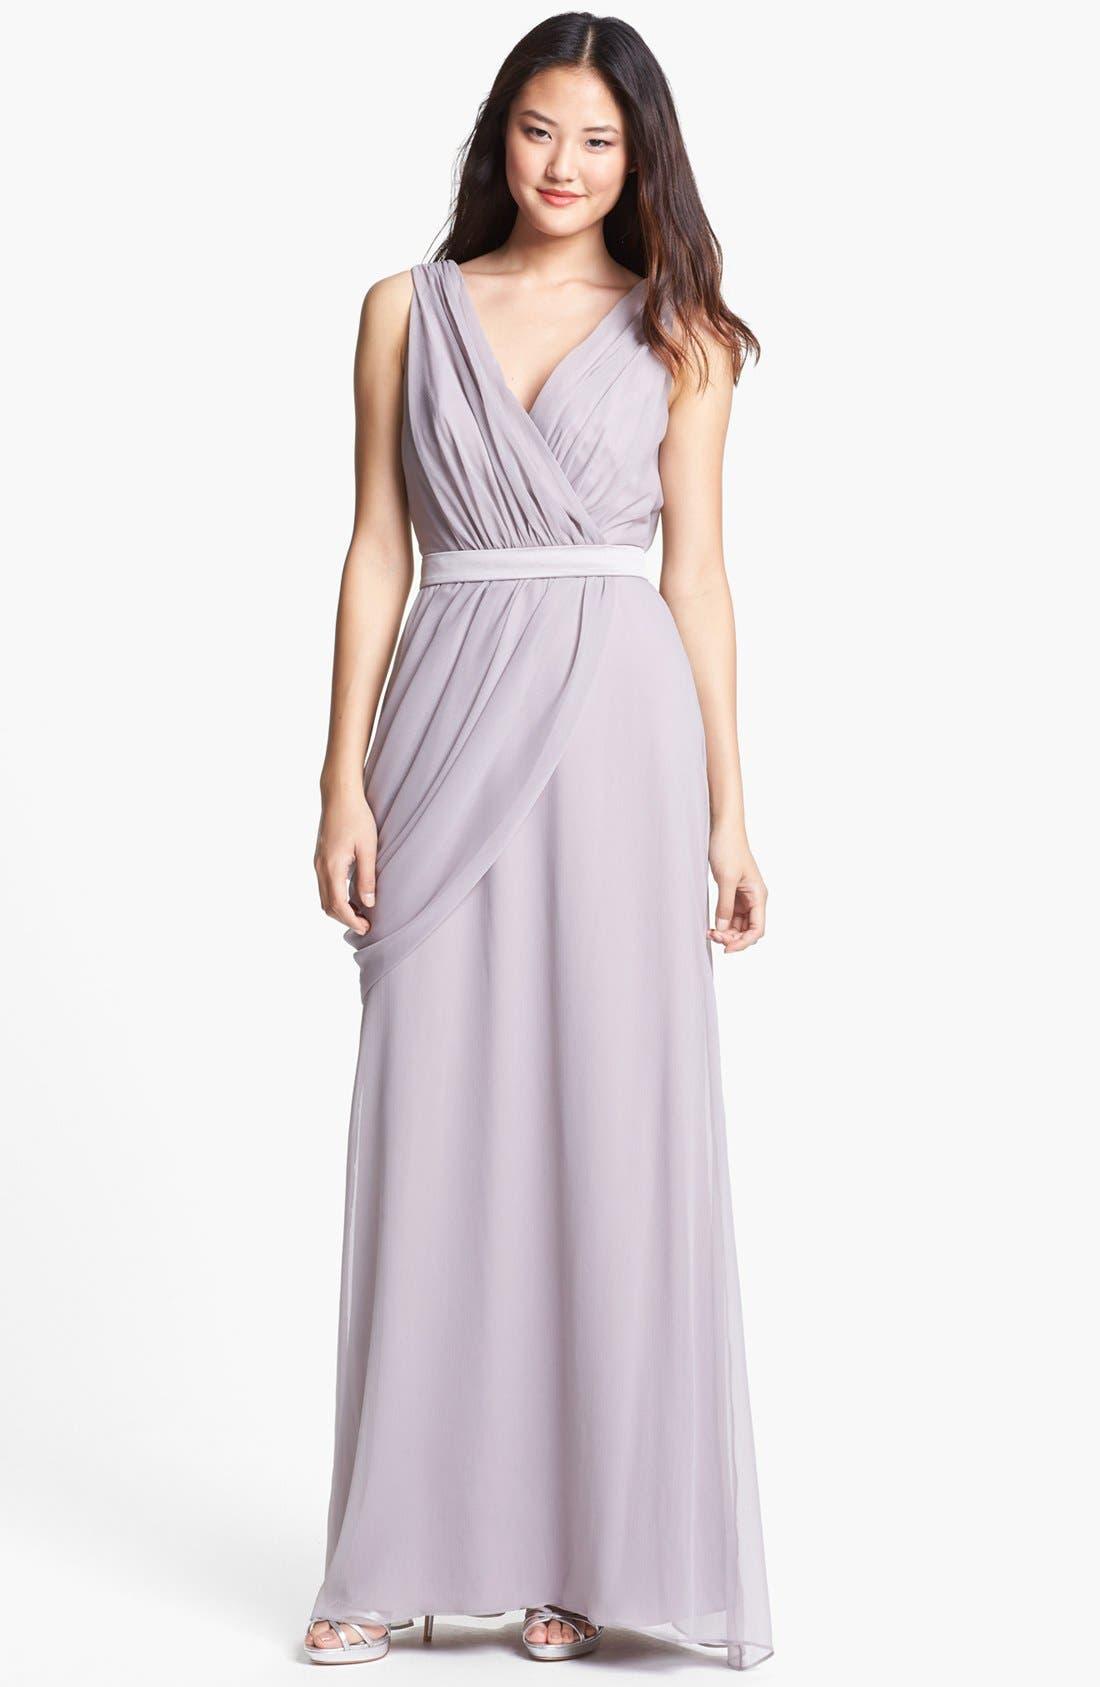 Draped Chiffon Dress,                             Main thumbnail 1, color,                             251